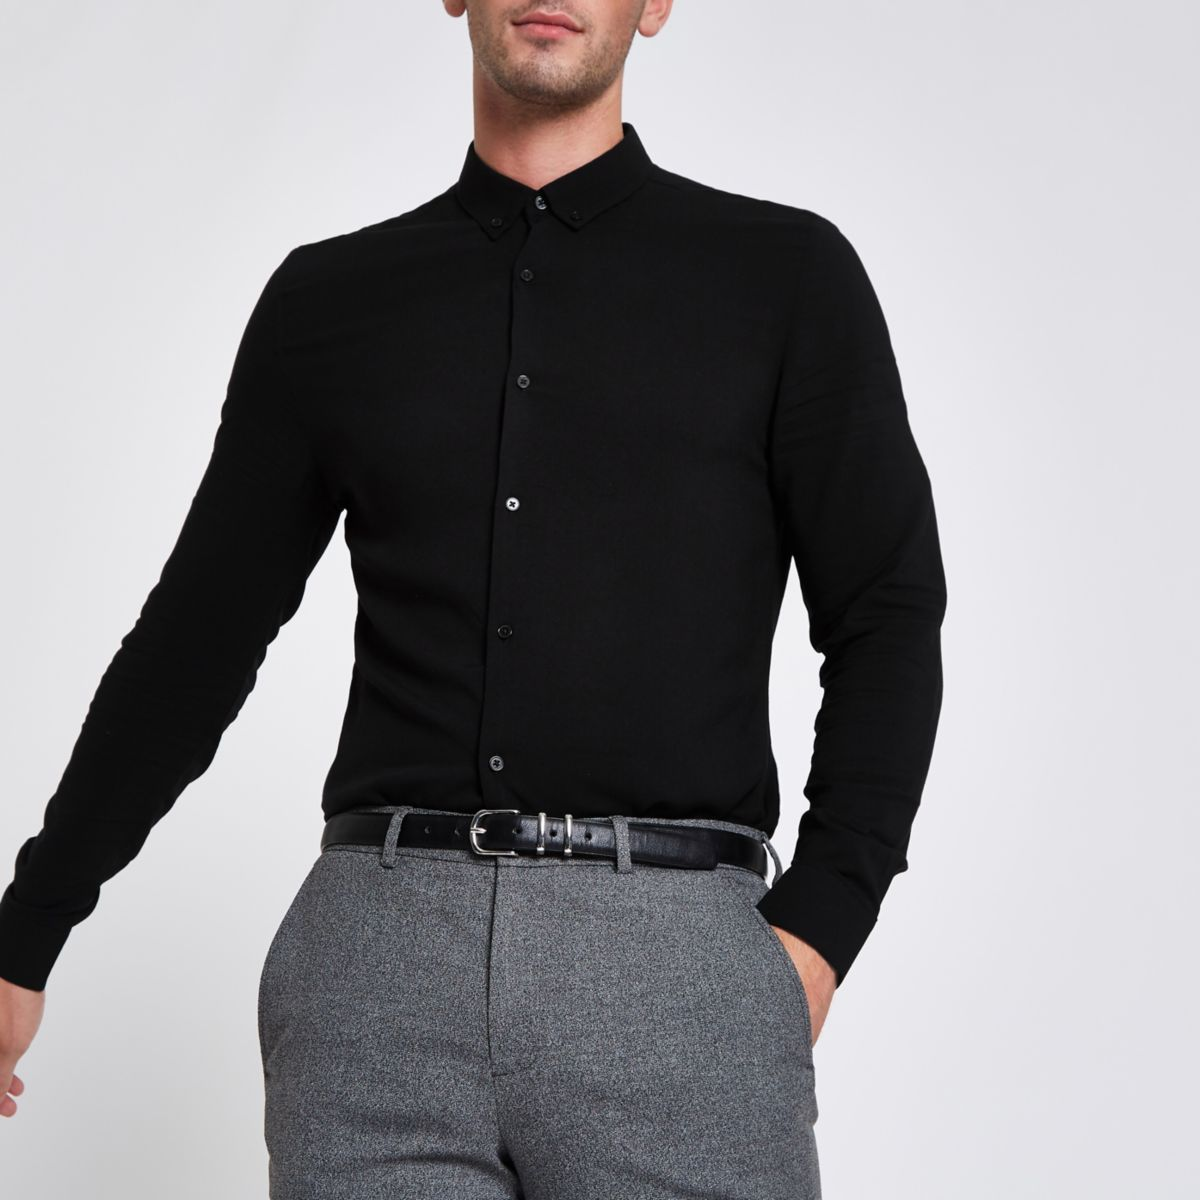 Black button-up long sleeve shirt